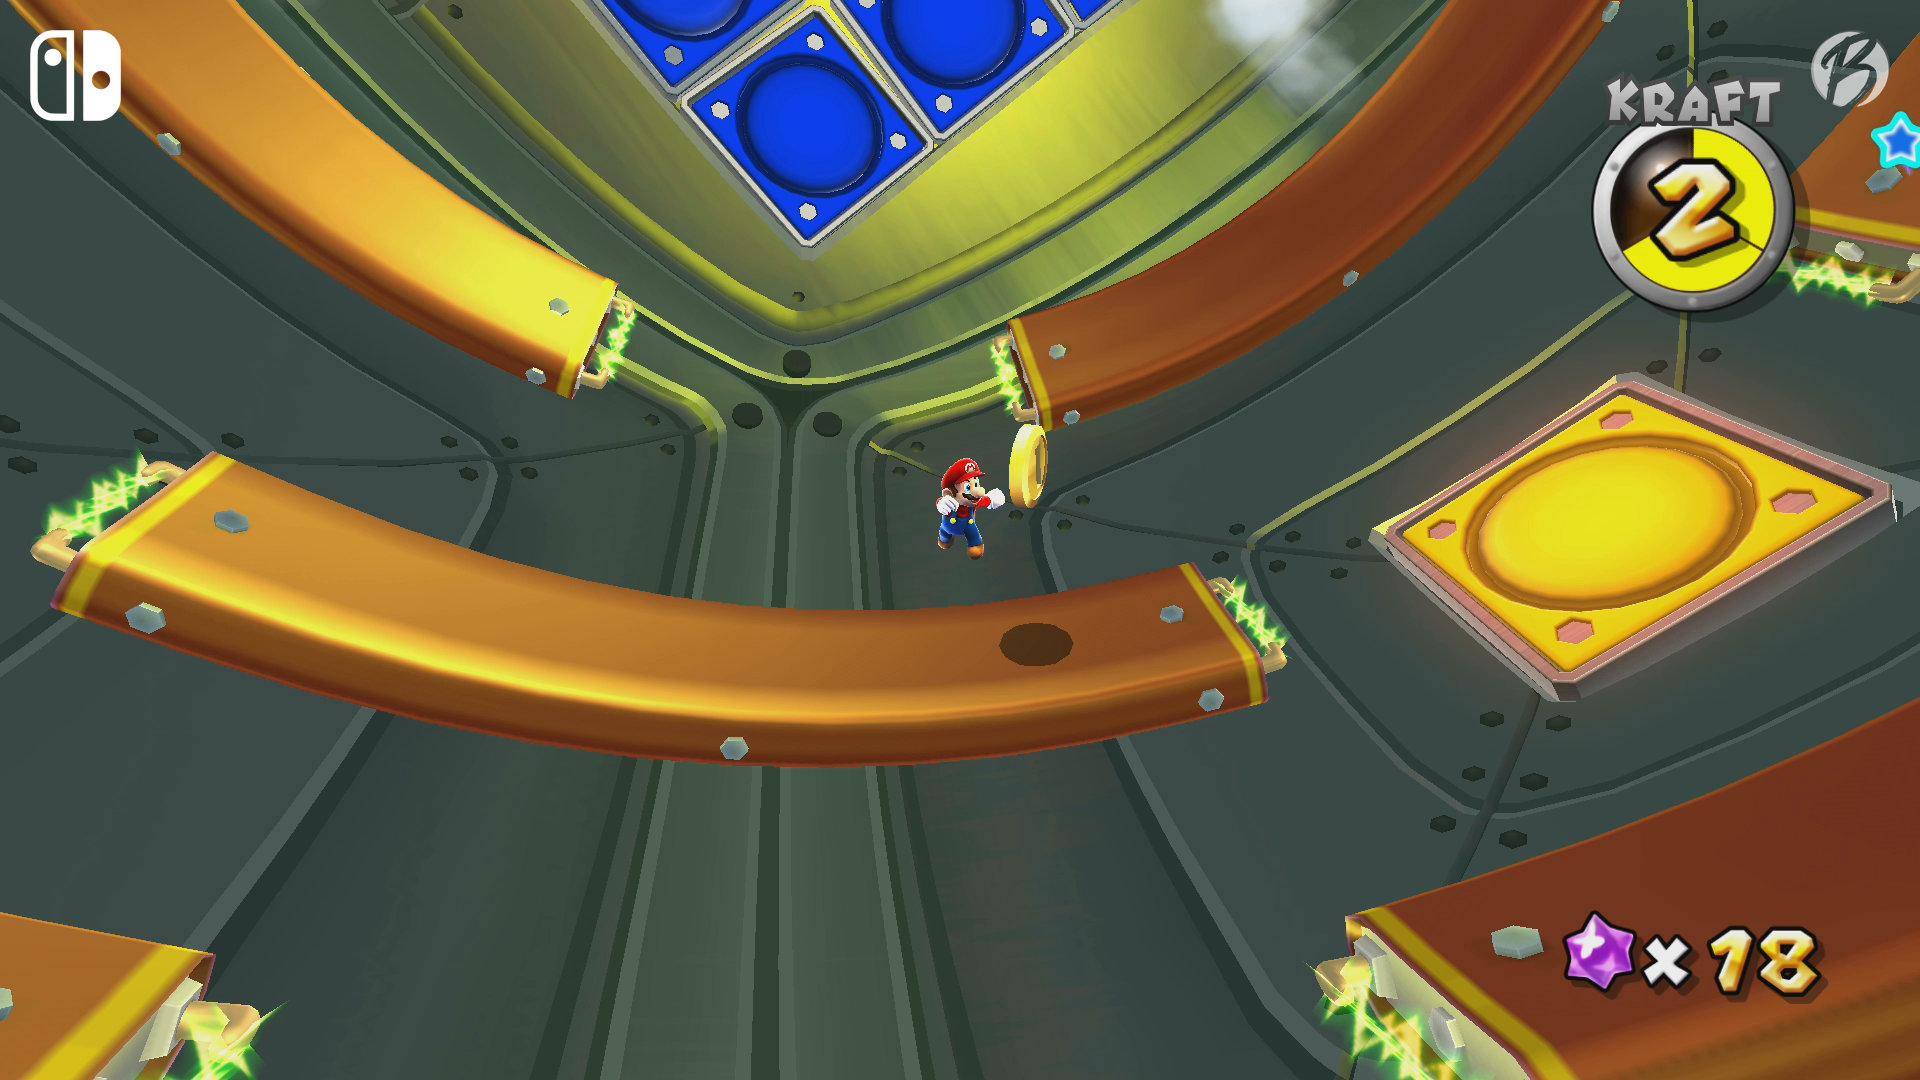 Super Mario 3D All-Stars - Super Mario Galaxy - Vergleich: Nintendo Switch